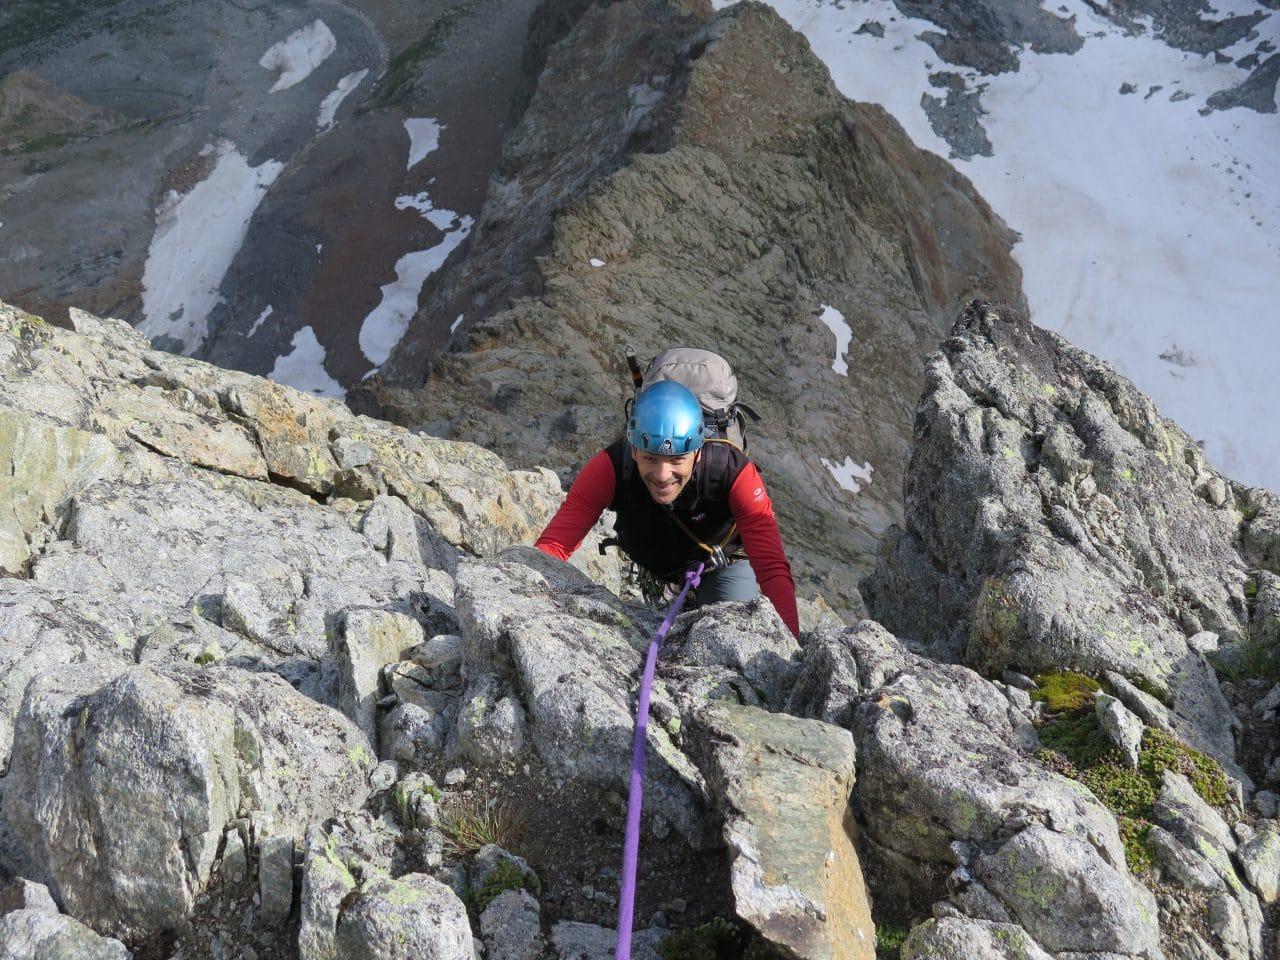 Eperon-nord-pointe-amont-Ecrins-helyum-guides-xavier-carrard-troisieme-ressaut-france